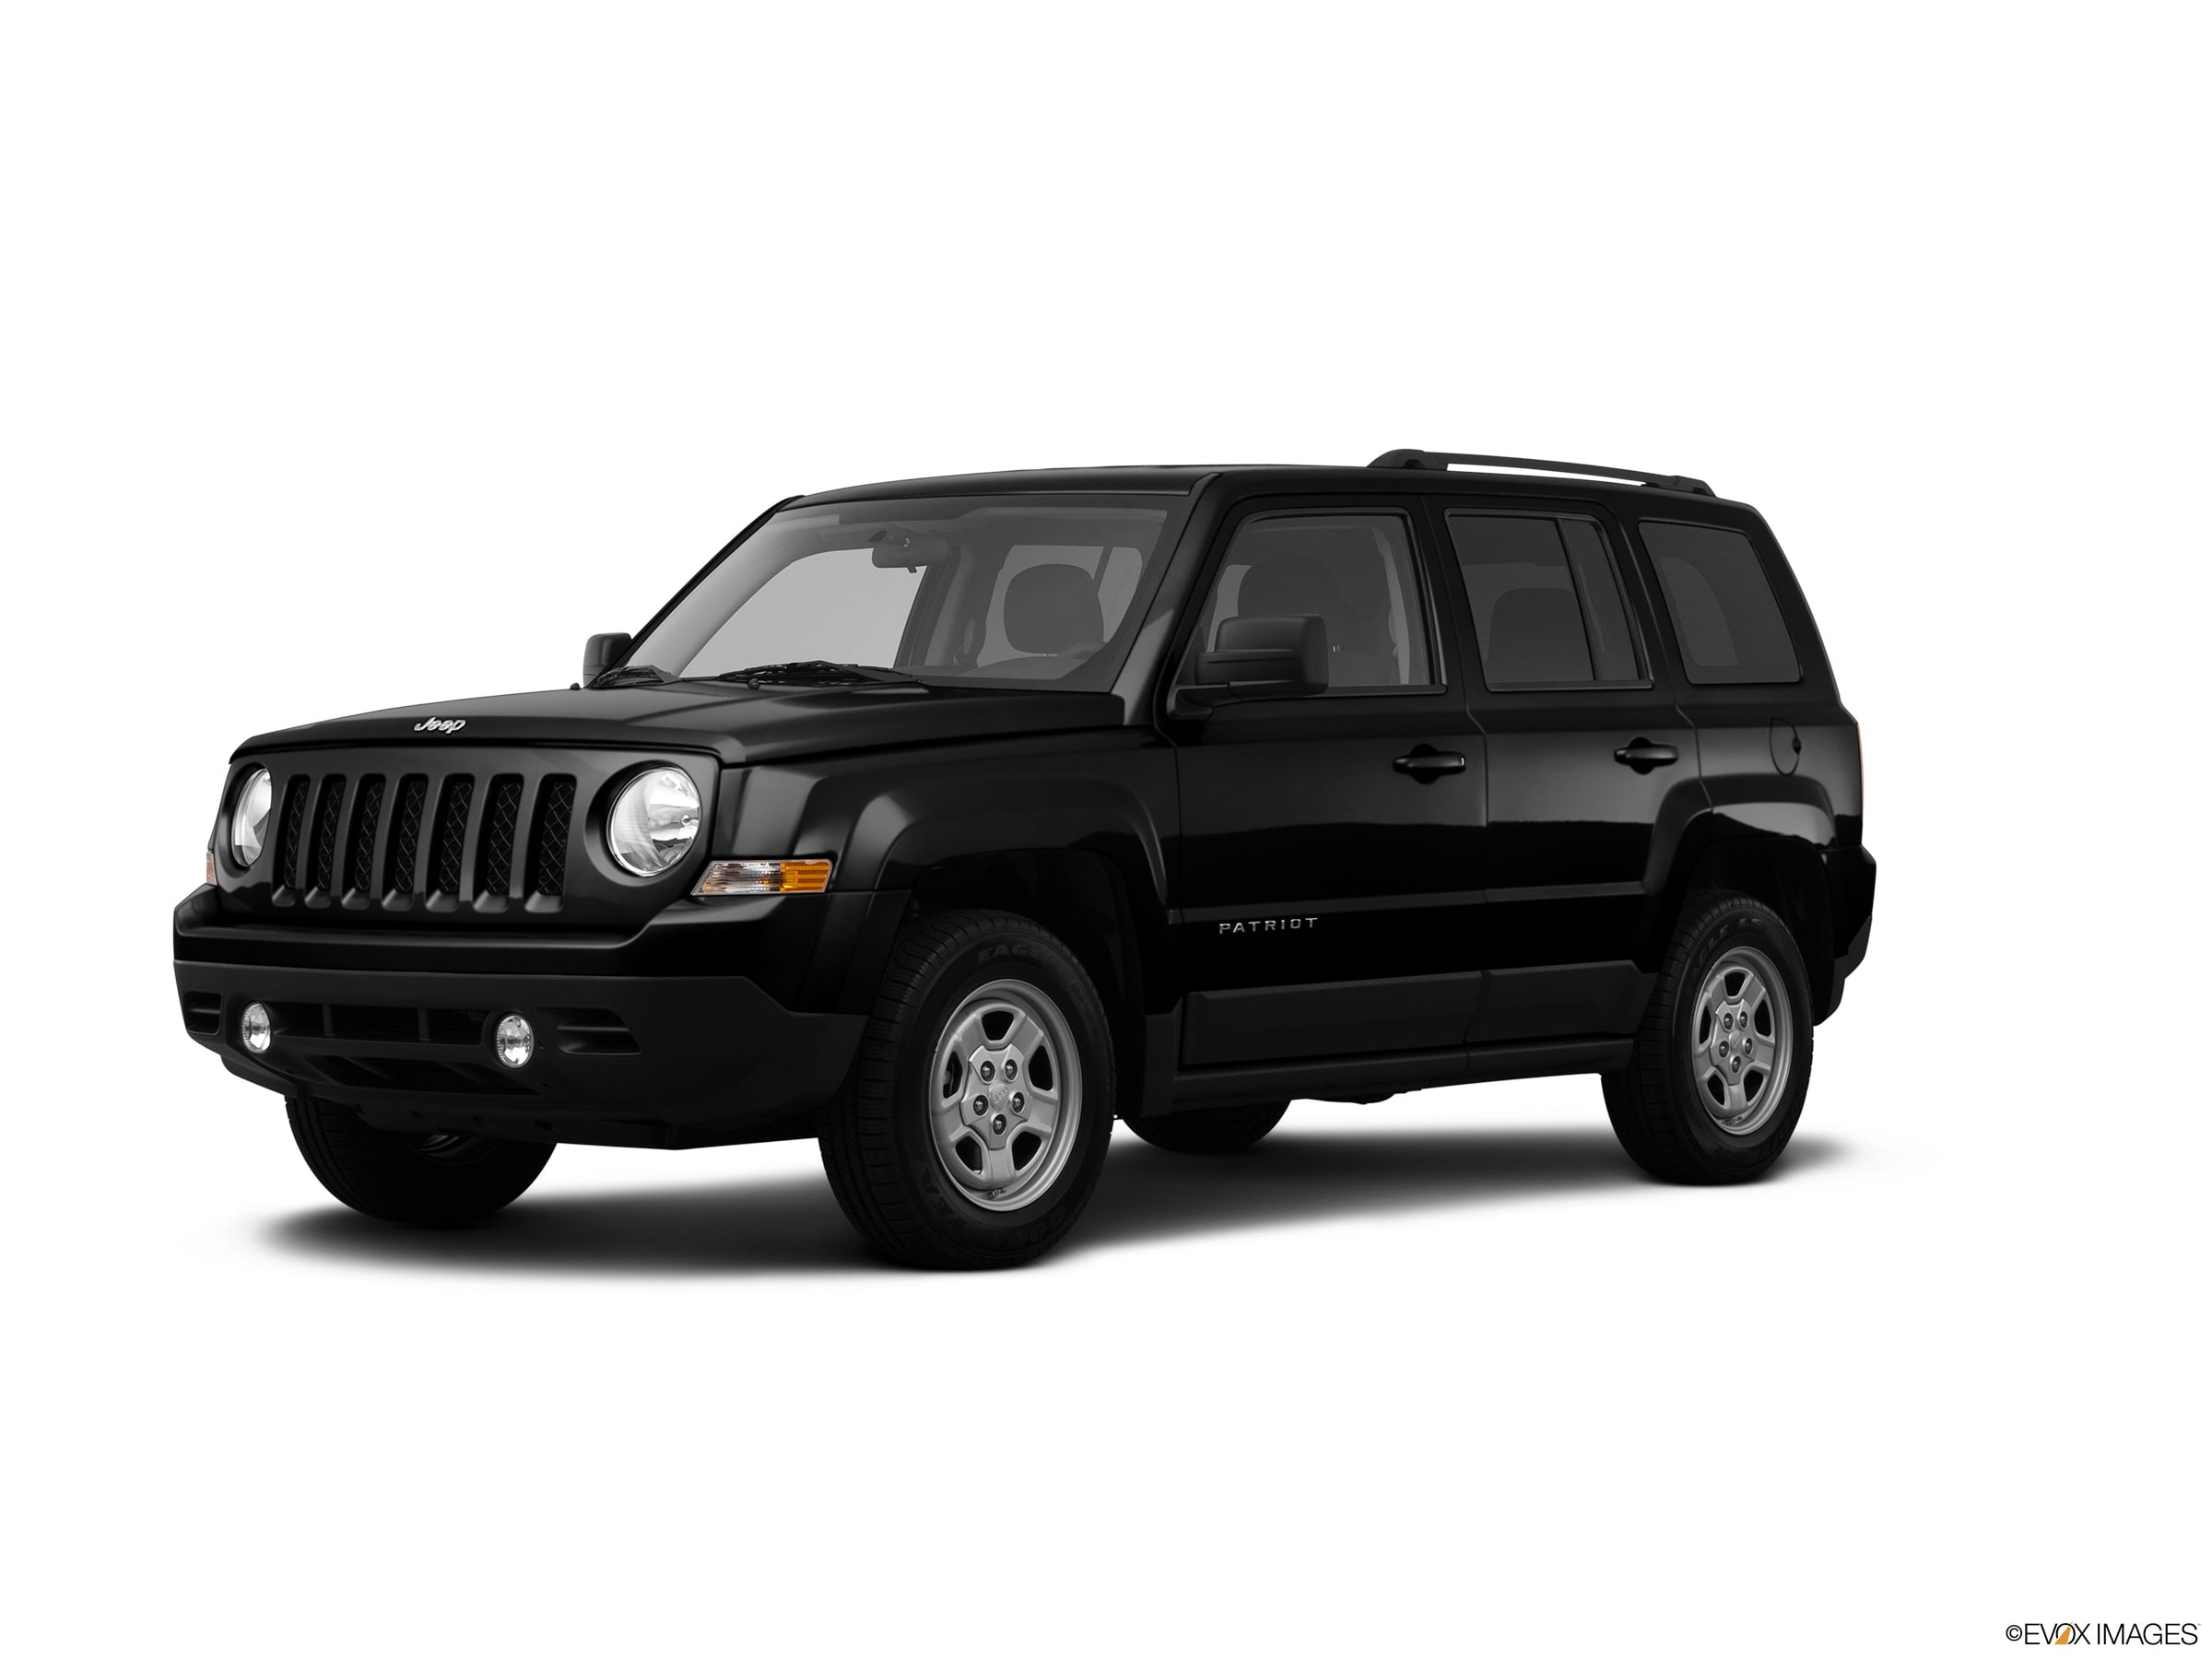 2012 Jeep Patriot SUV